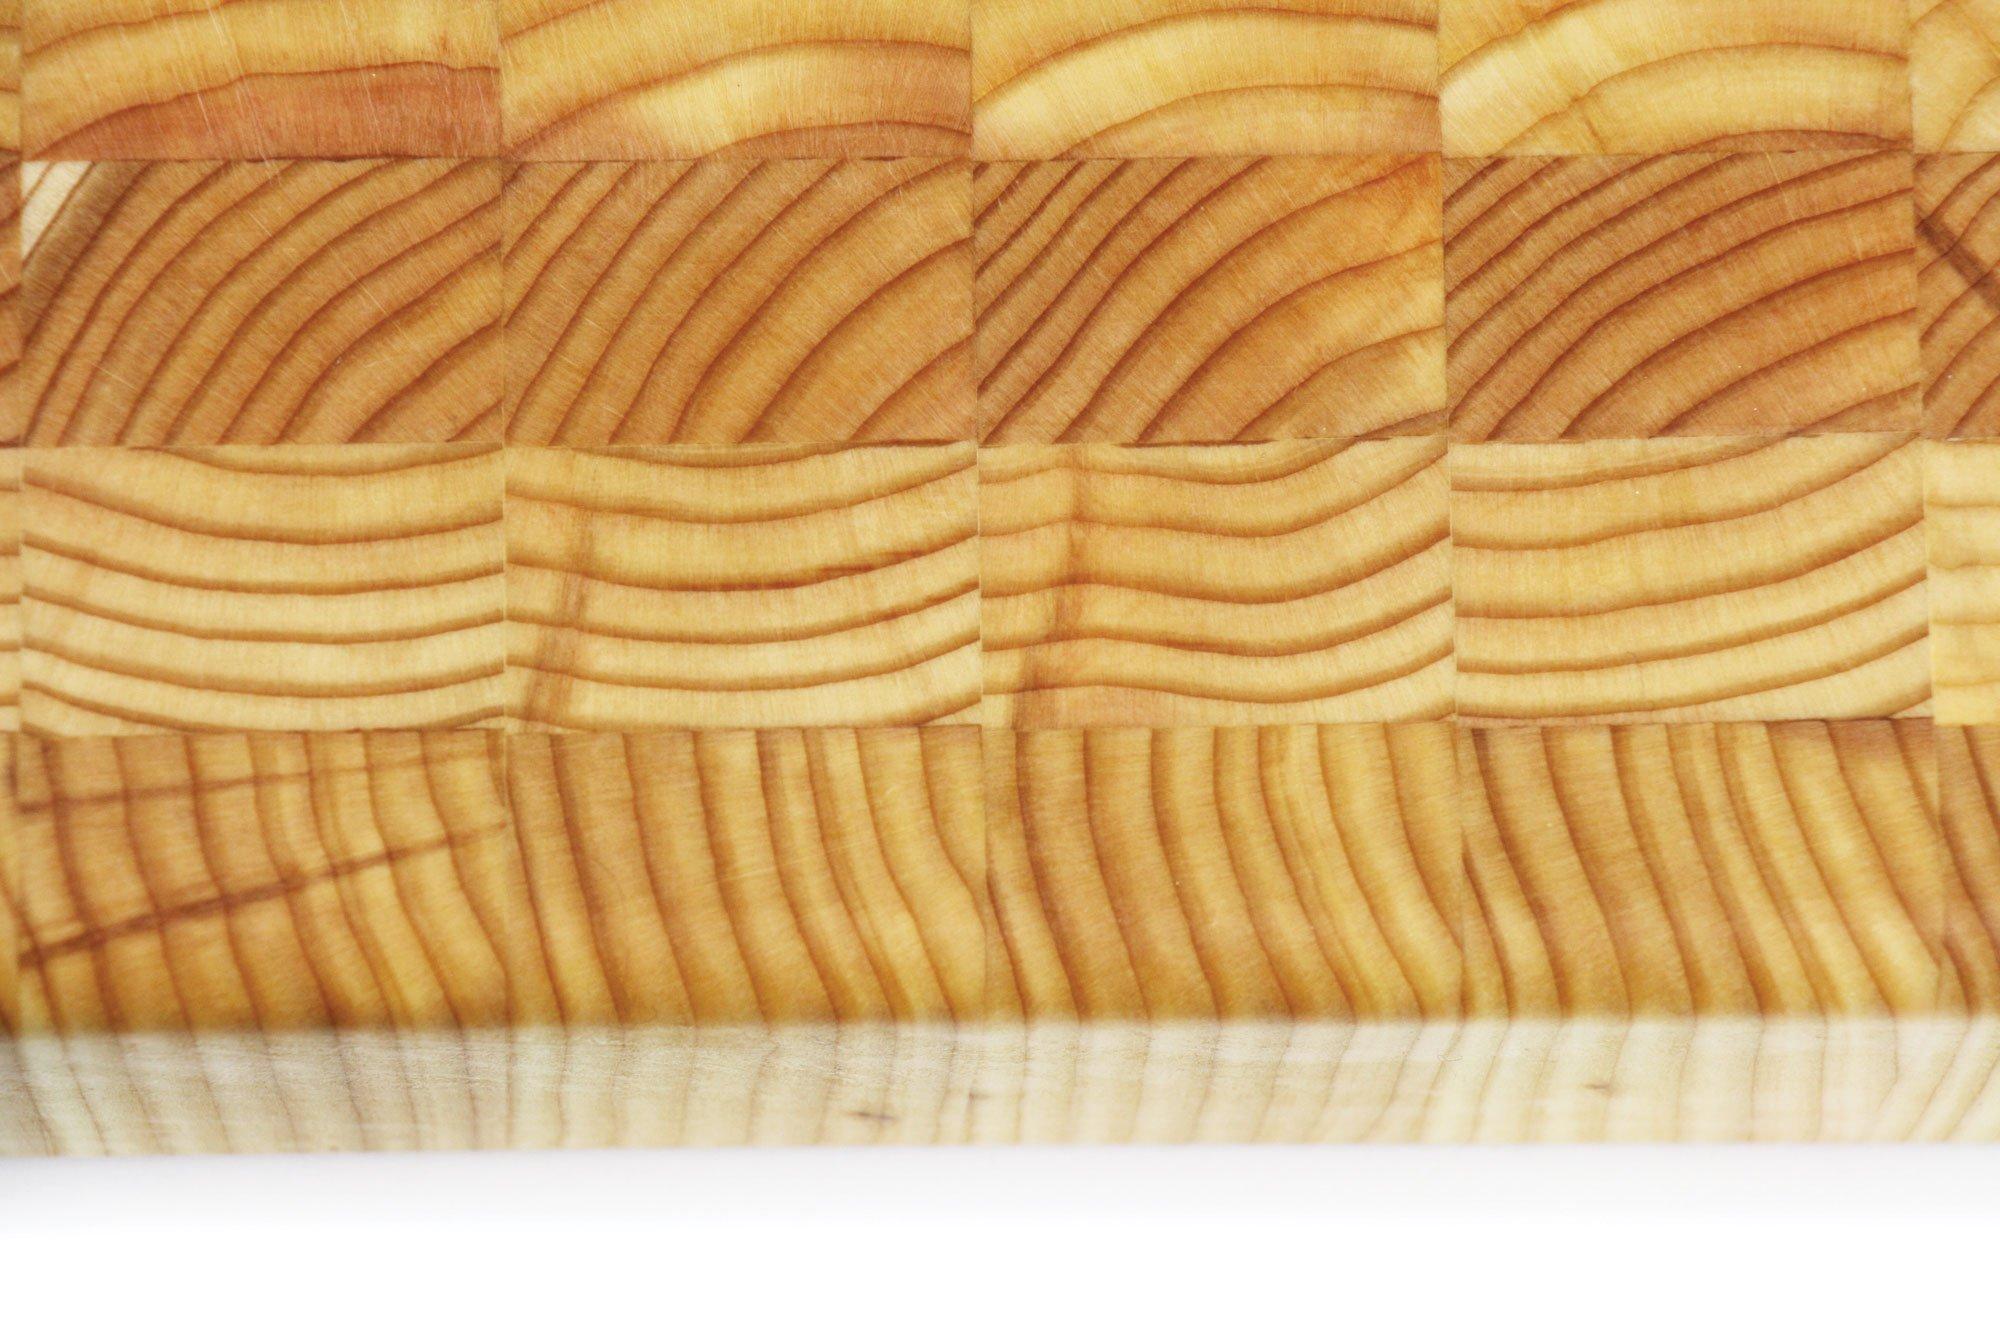 Larch Wood 24 x 18 x 2-inch End Grain Cutting Board by Larch Wood (Image #3)